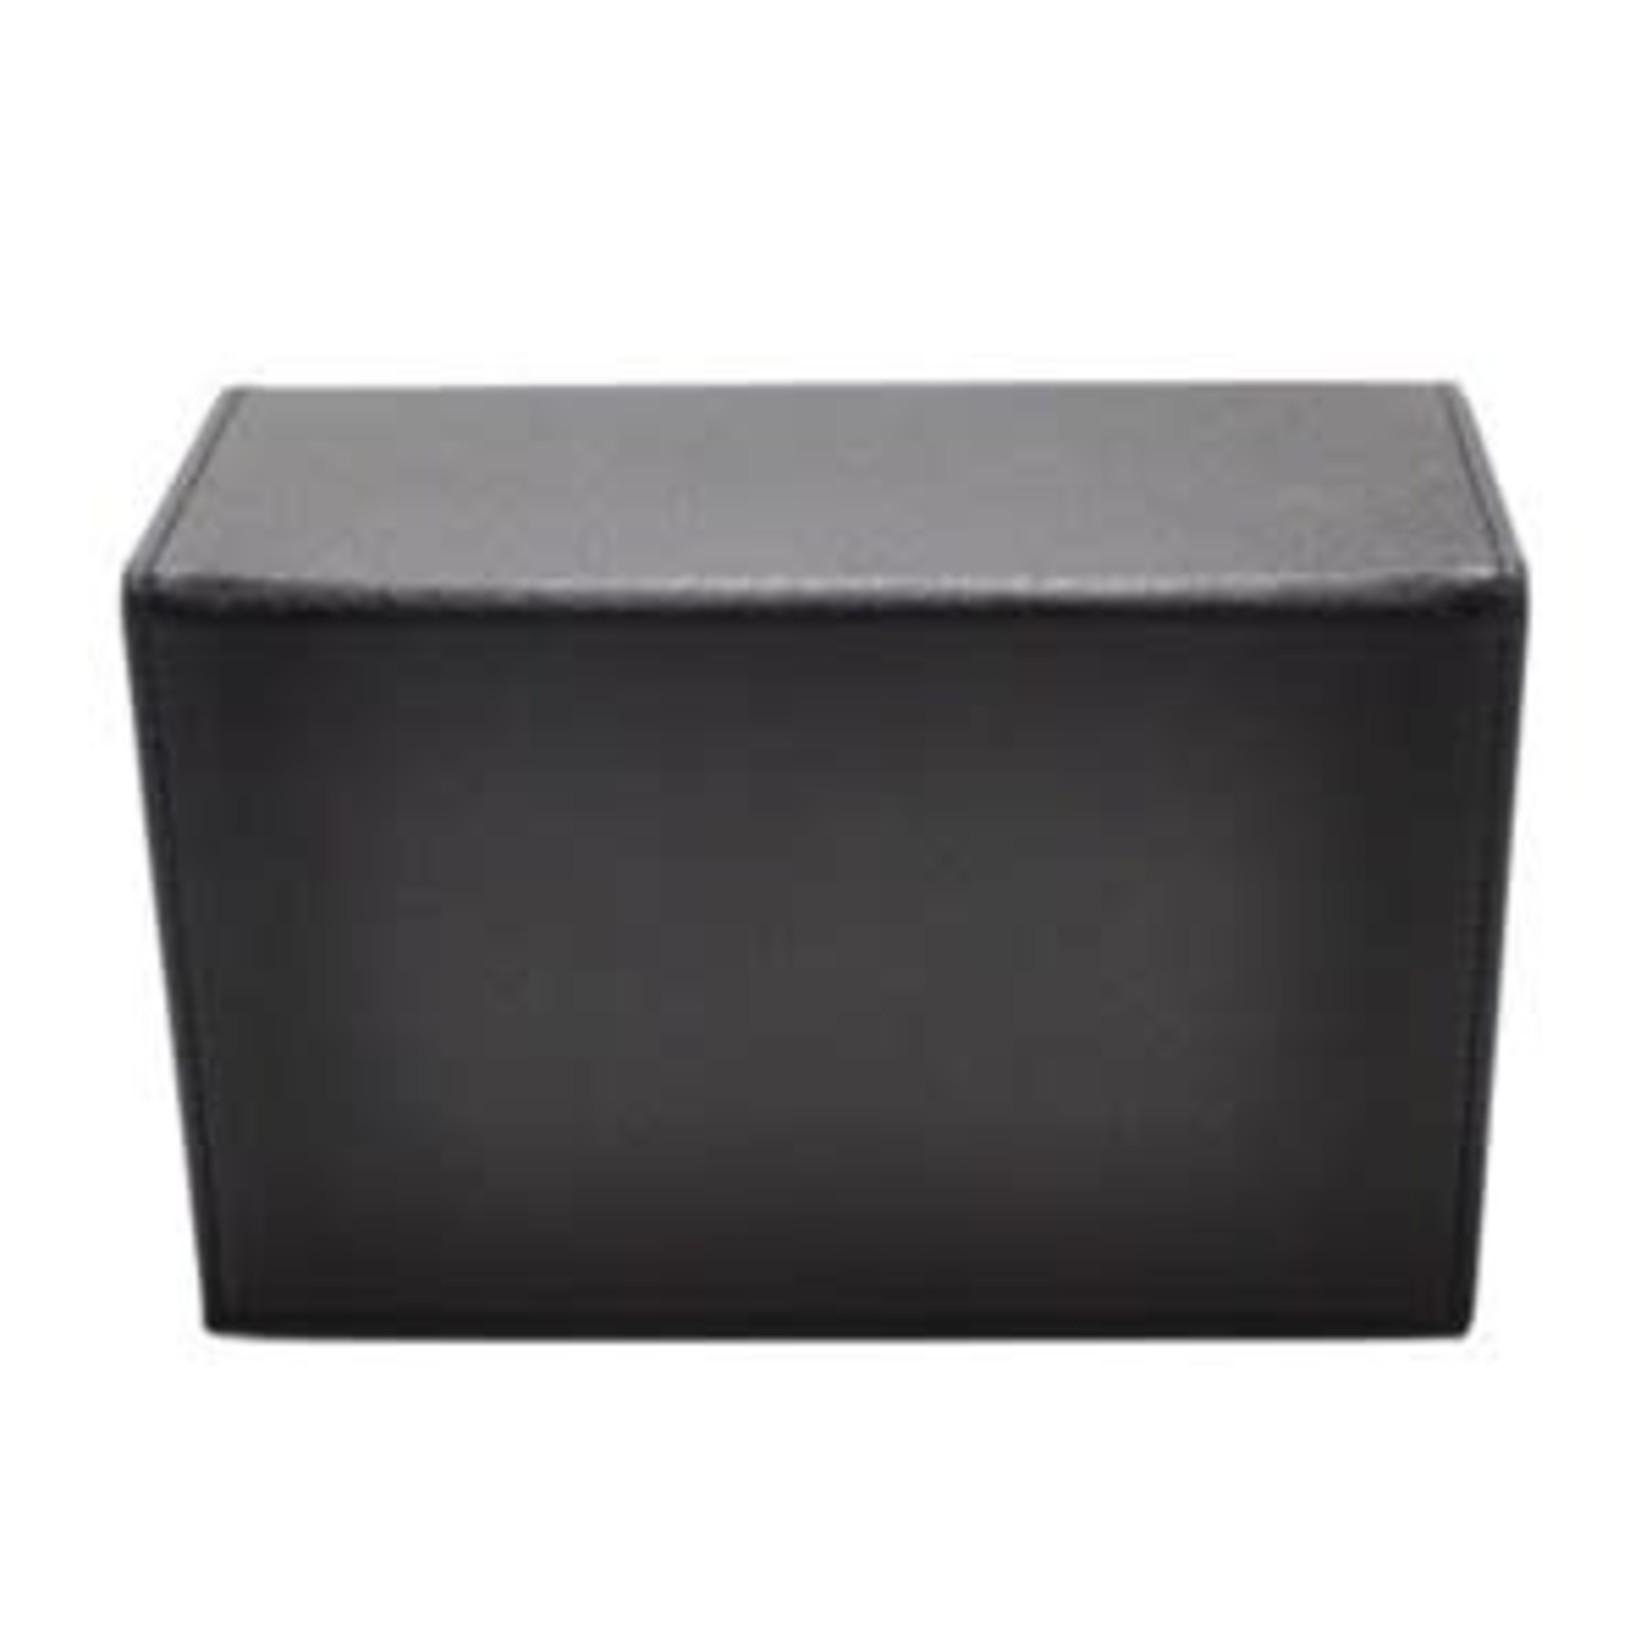 Deck Box Dualist Black